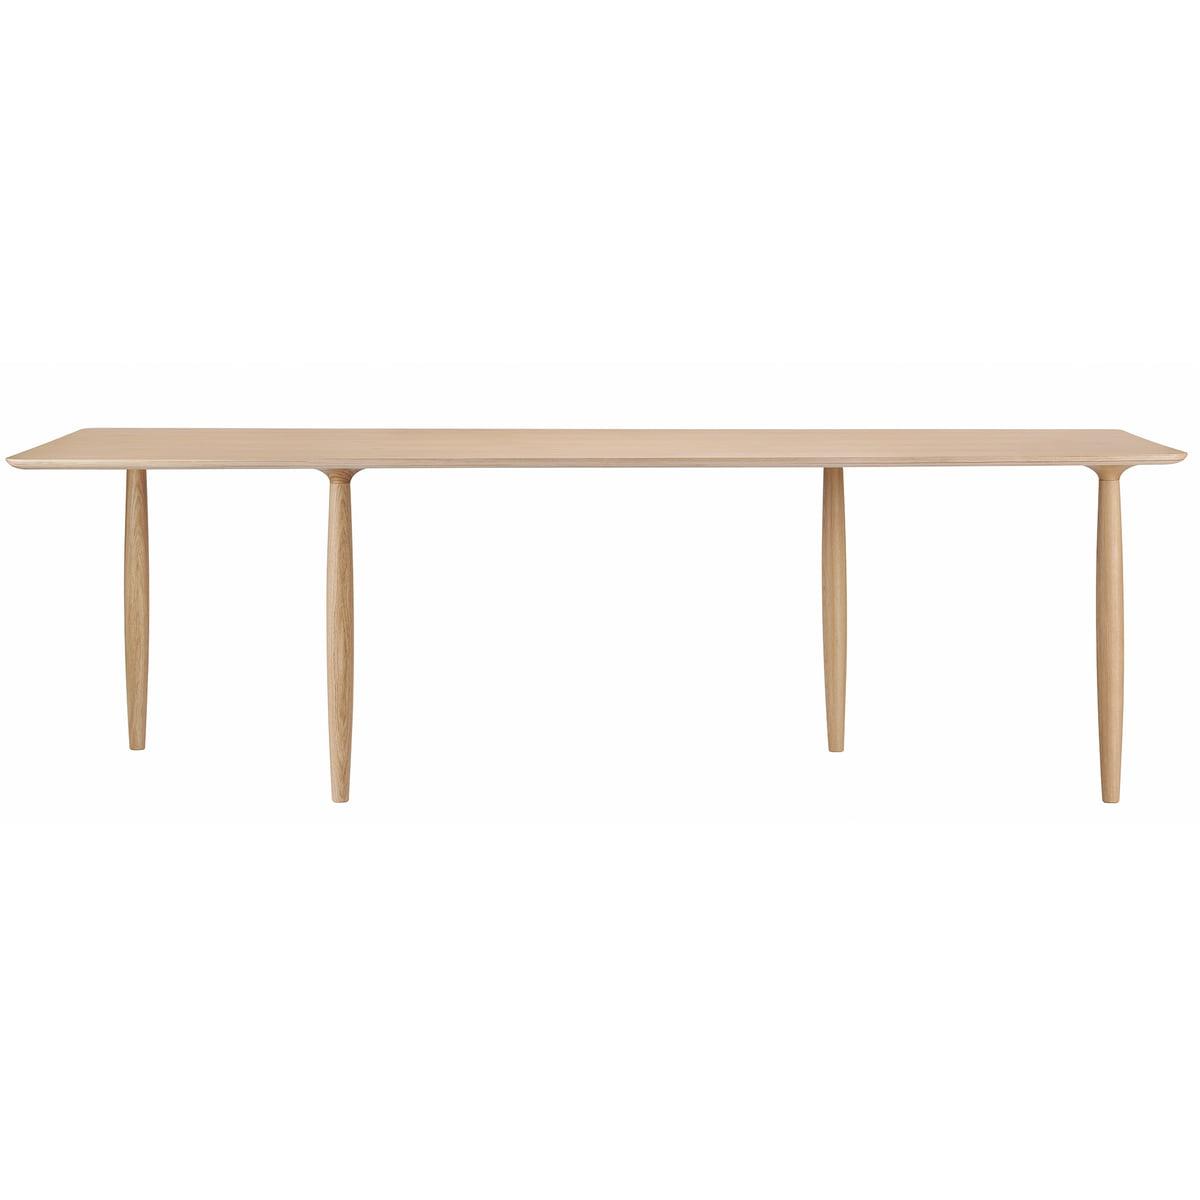 Norr11 Oku spisebord, ø 120 cm naturlig eg